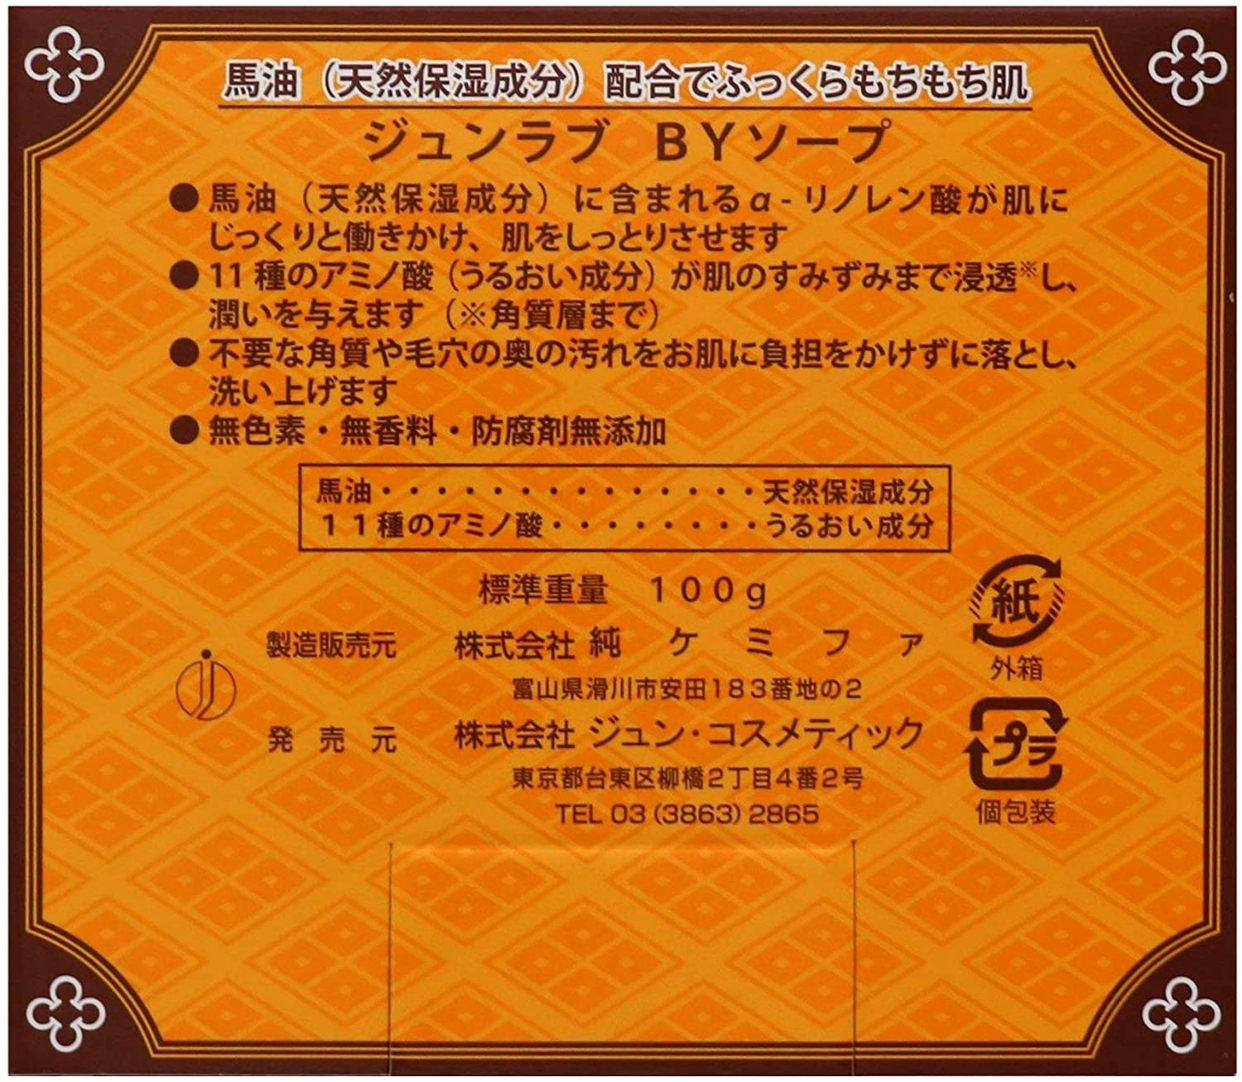 JUN COSMETIC(ジュン・コスメティック) 馬油石けんNの商品画像2